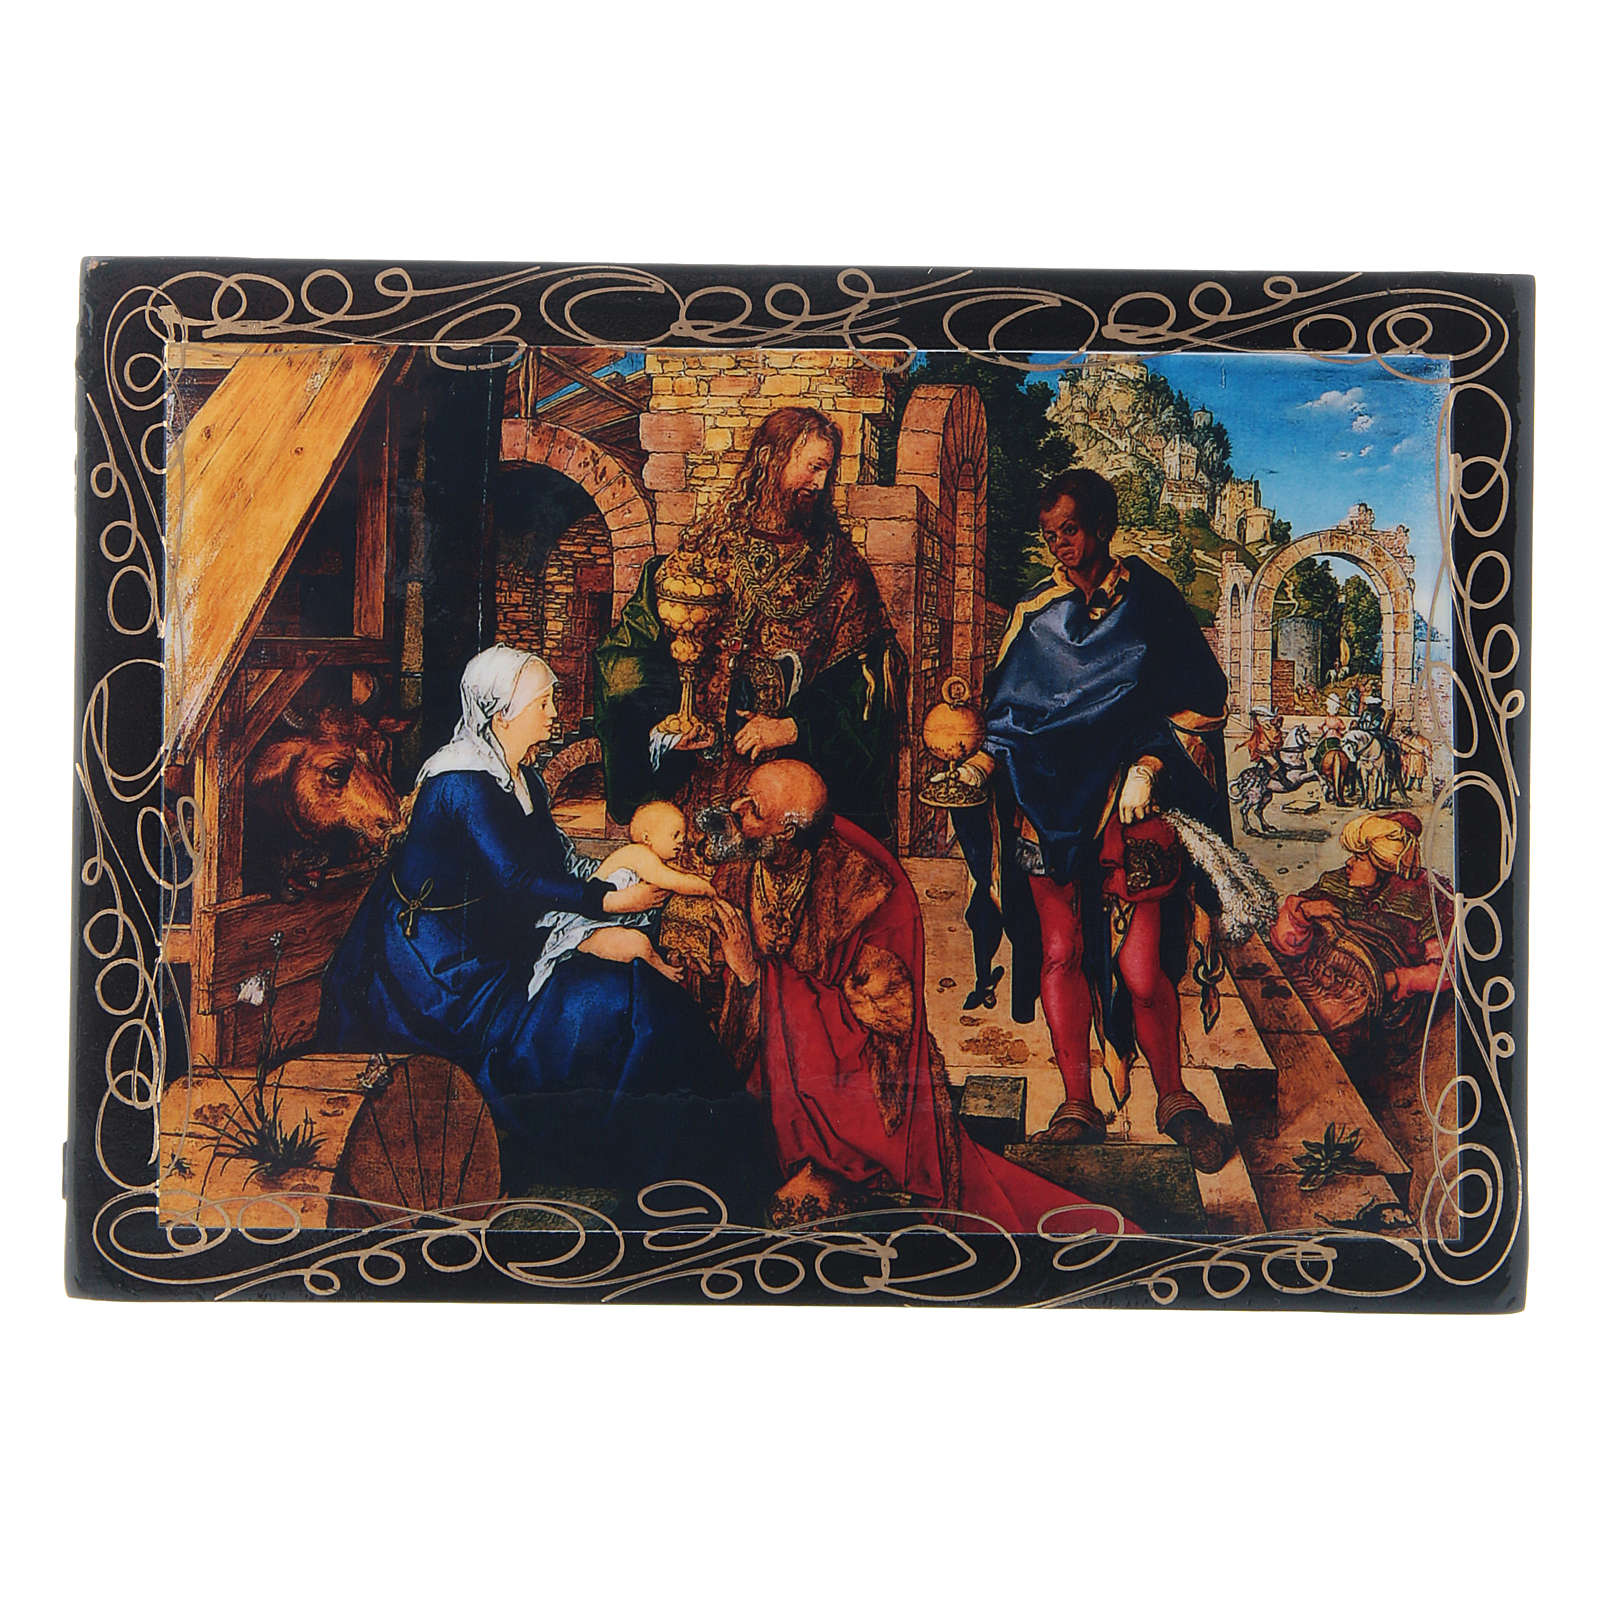 Russian lacquer box, Adoration of the Magi 14x10 cm 4